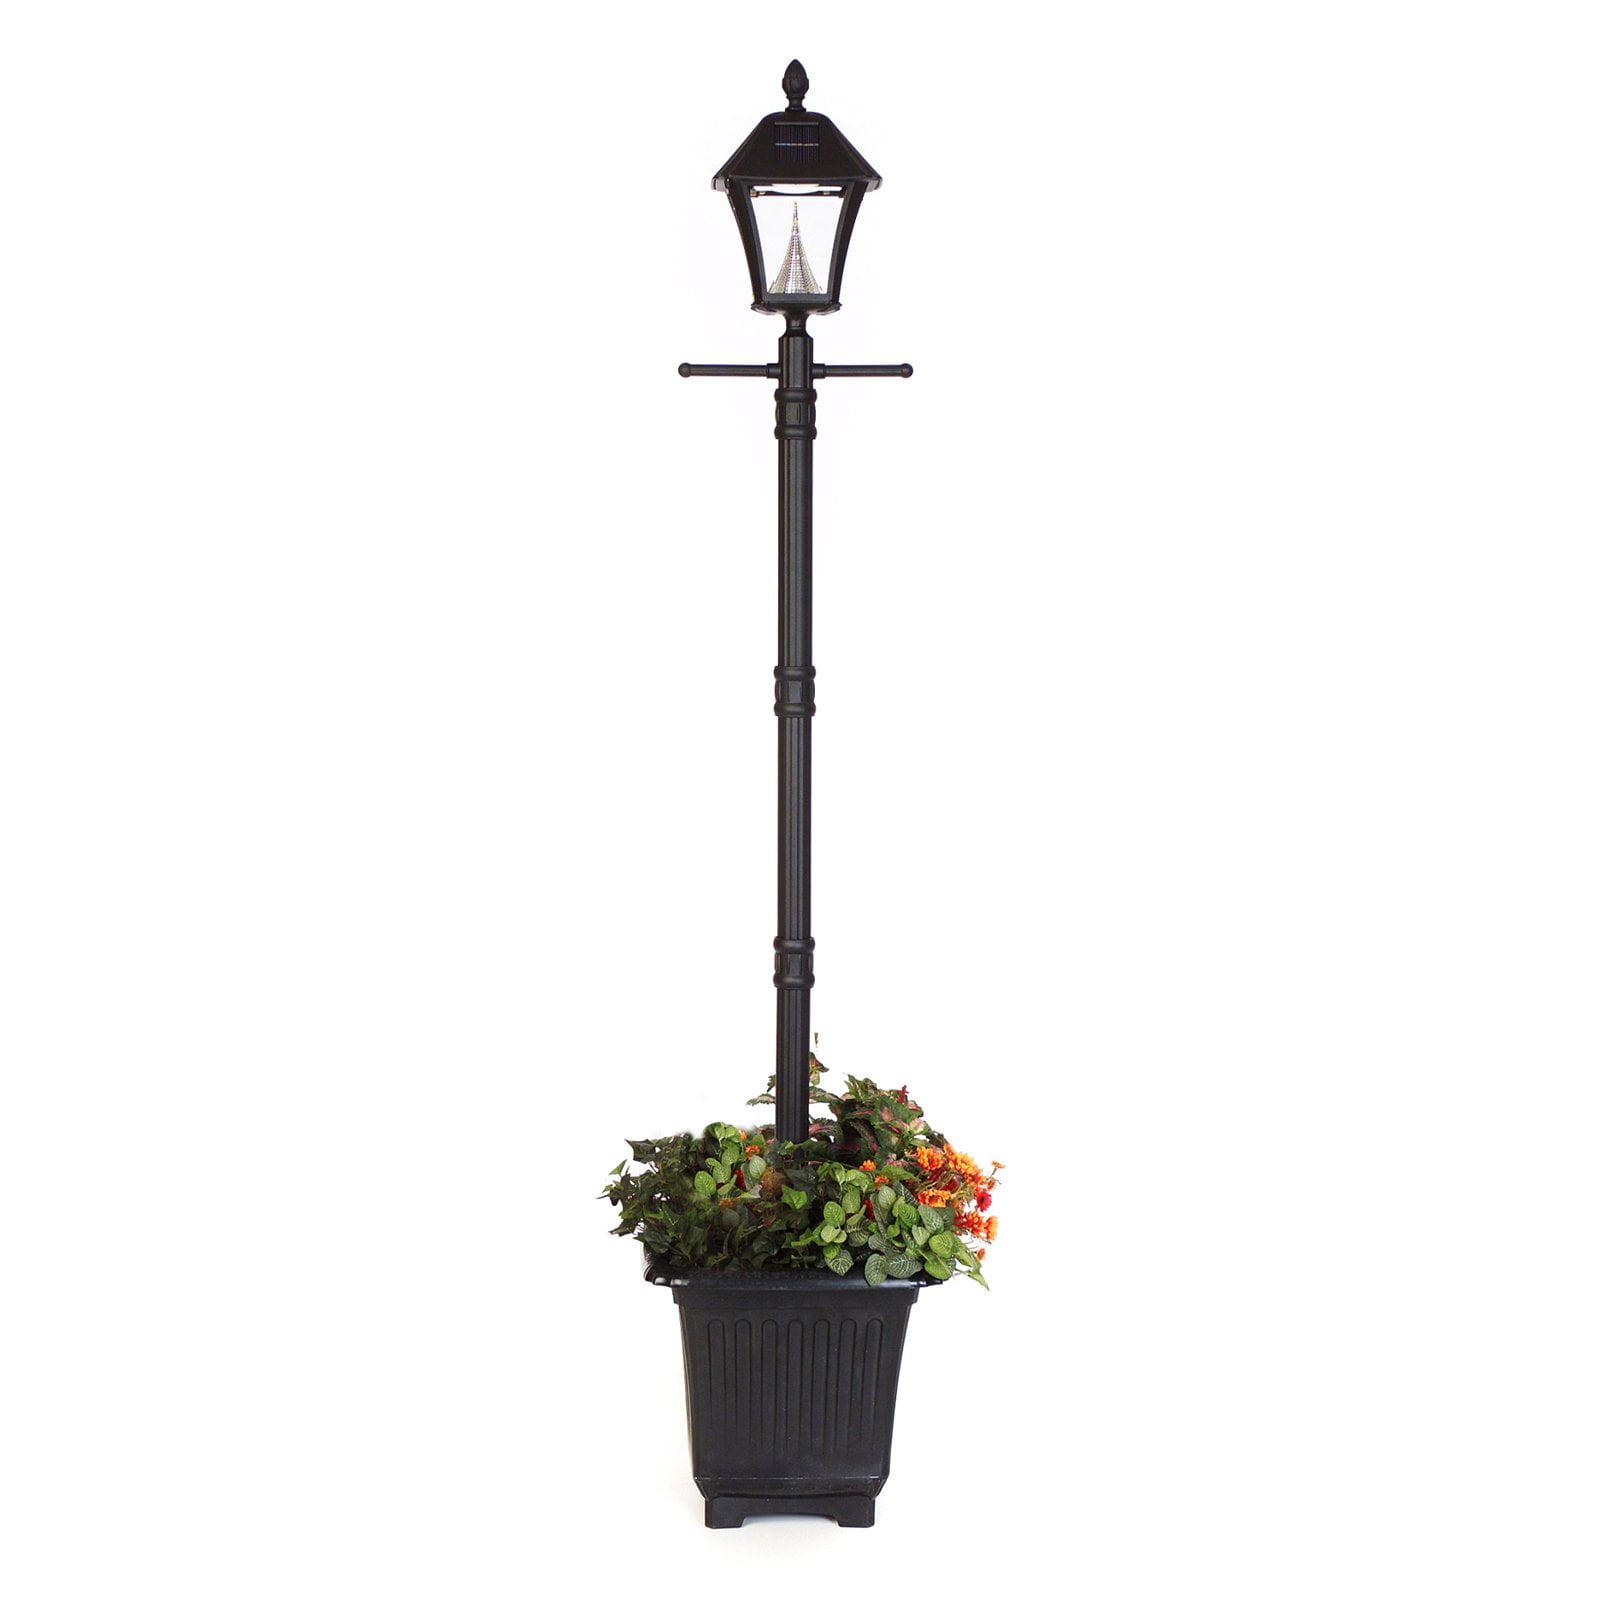 Gama sonic baytown solar lamp post with planter walmart aloadofball Image collections